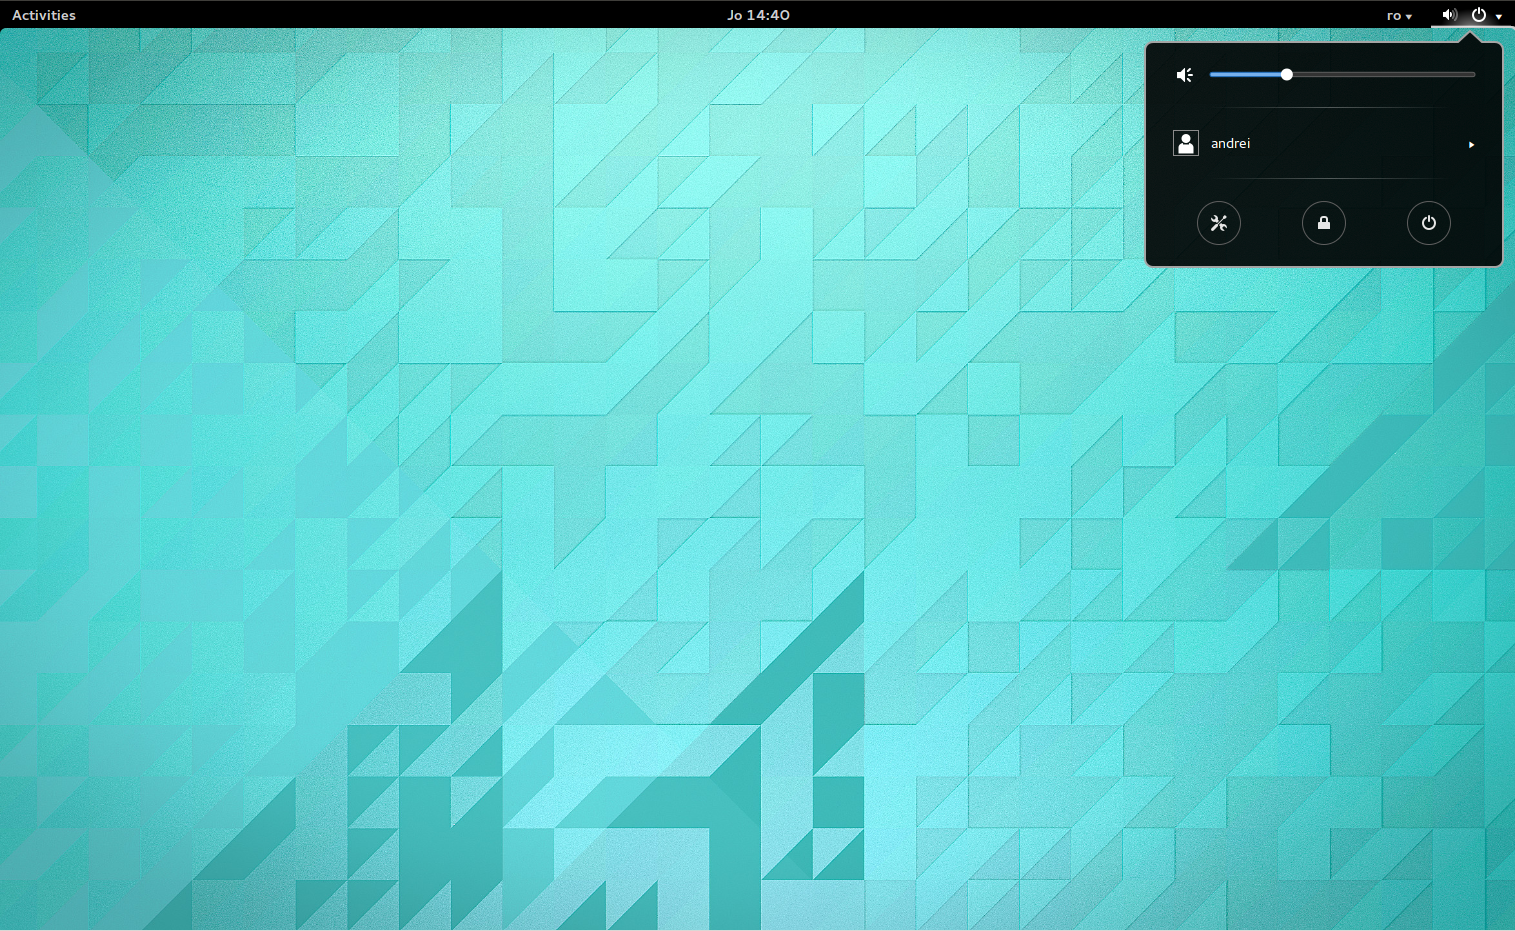 Ubuntu 14.04 LTS desktop